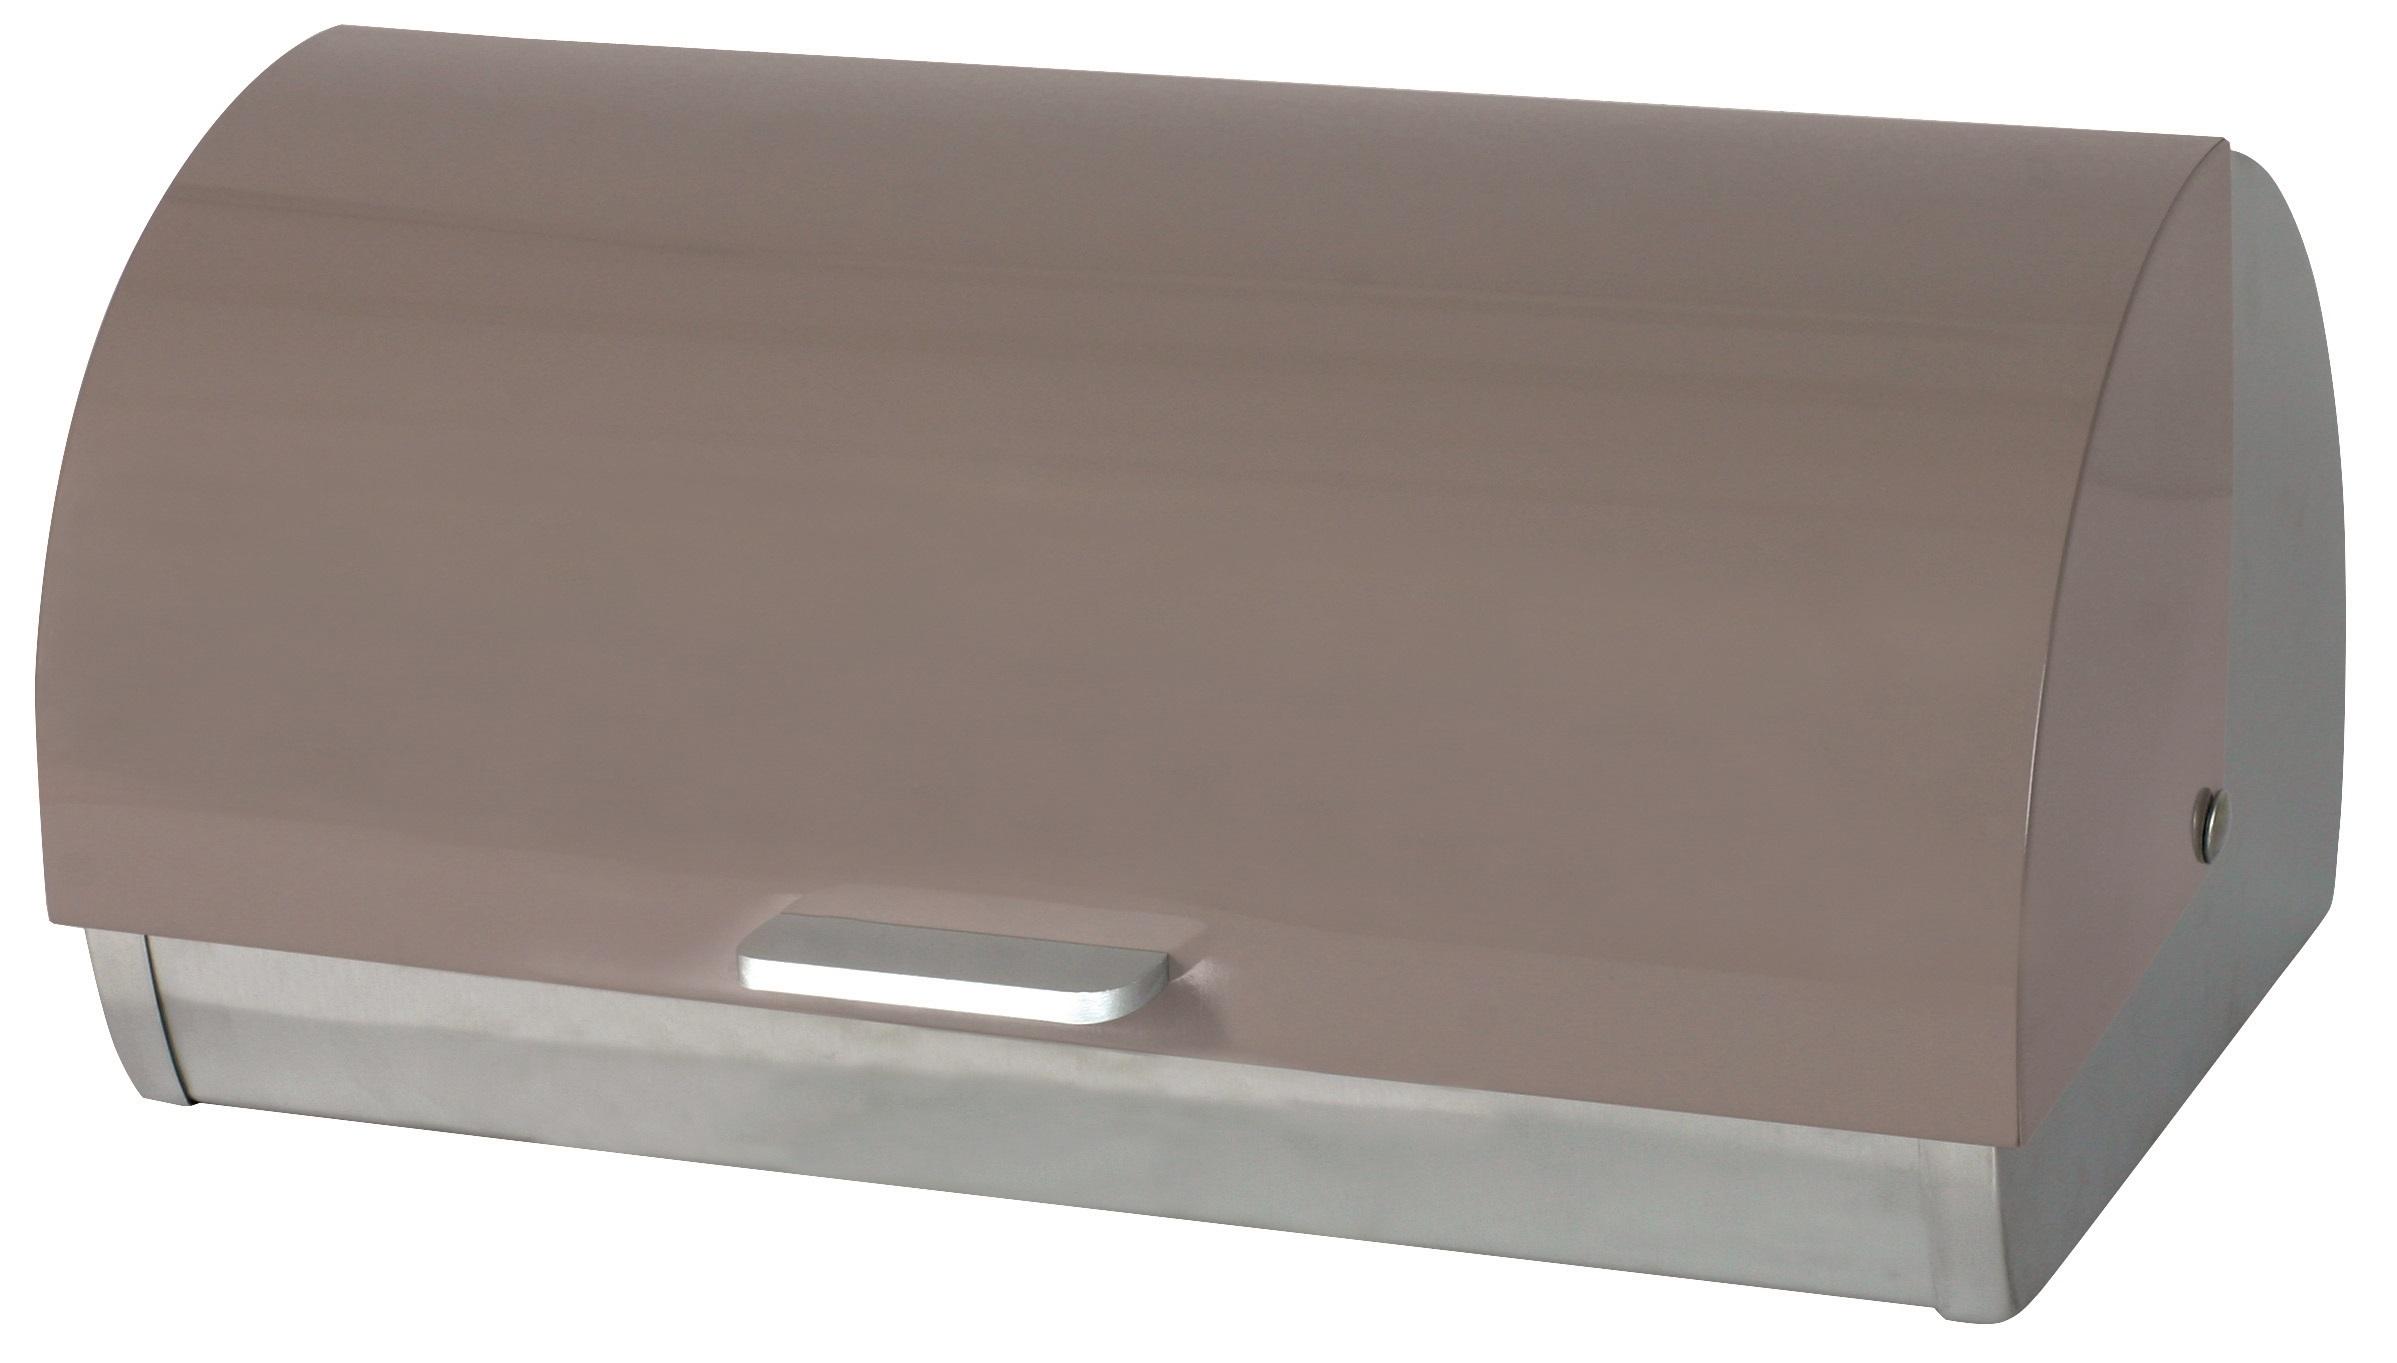 Chlebak Fusion Fresh 39 x 28 x 18,5 cm taupe AMBITION